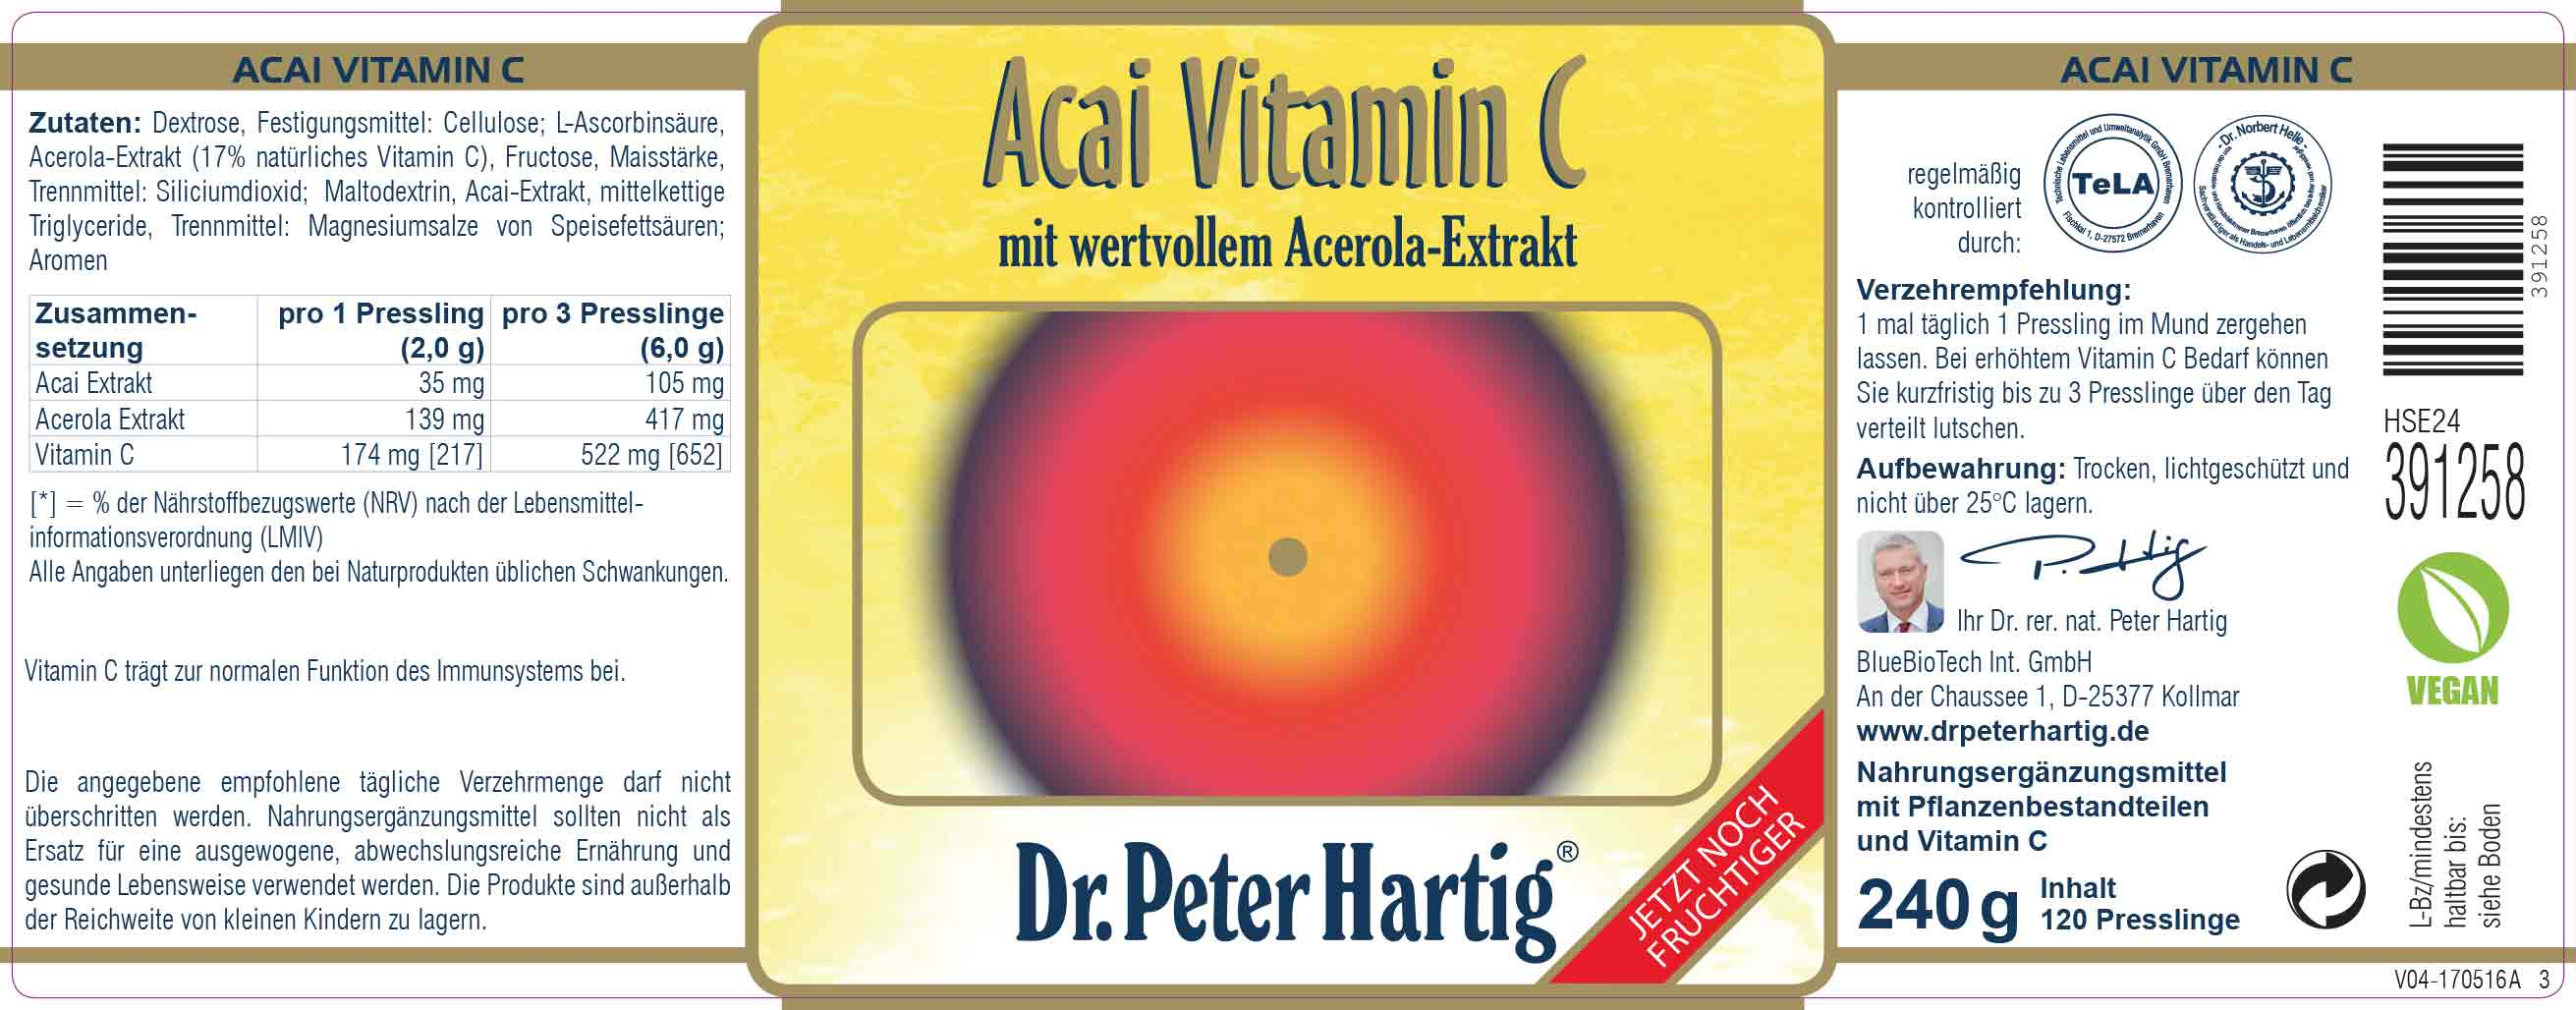 acai vitamin c 120 mega presslinge dr peter hartig. Black Bedroom Furniture Sets. Home Design Ideas